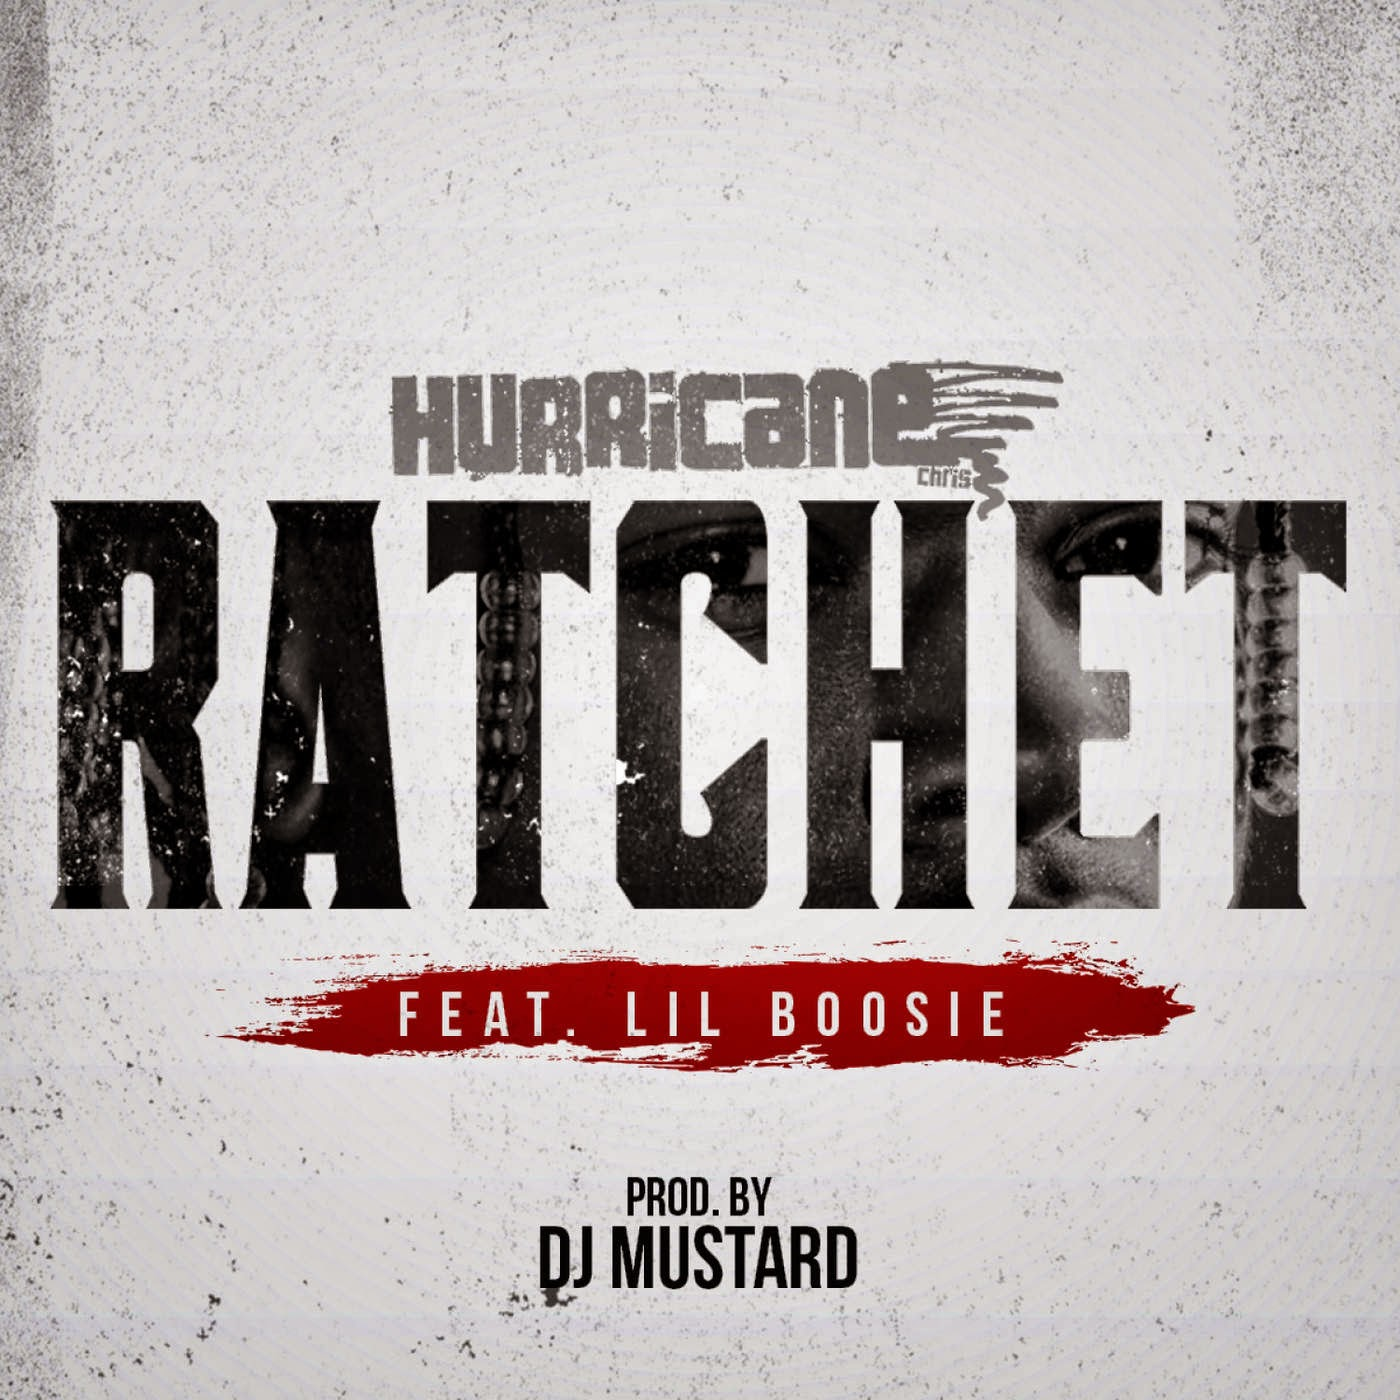 Hurricane Chris - Ratchet (feat. Lil Boosie) - Single Cover